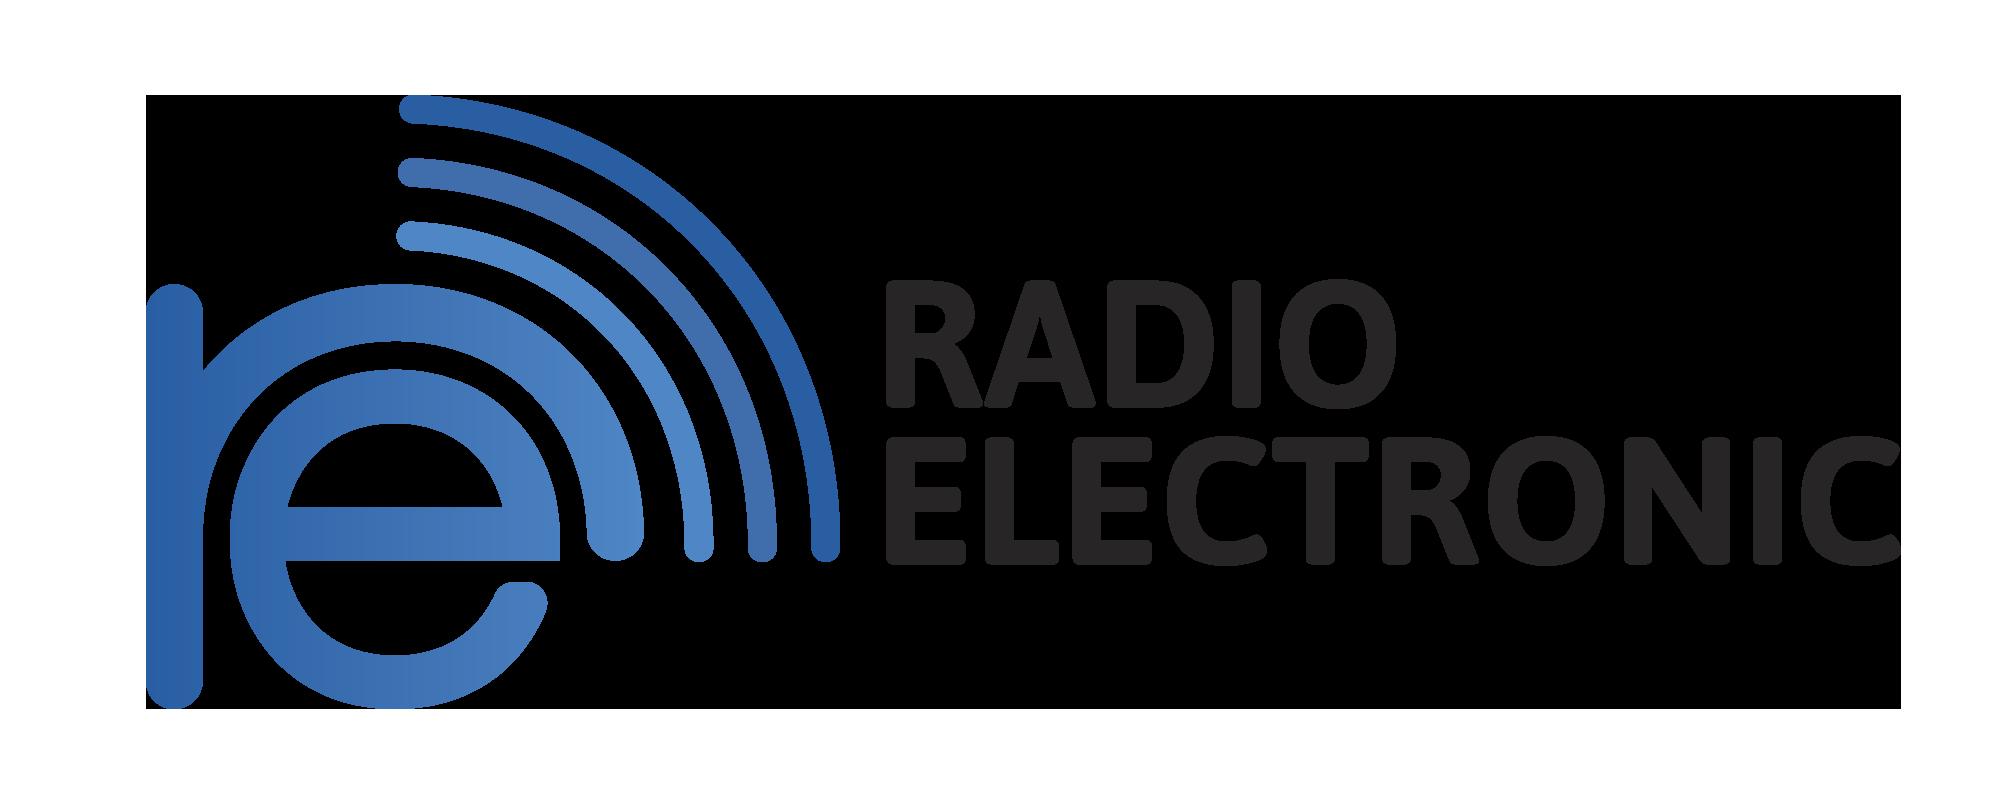 Radio Electronic